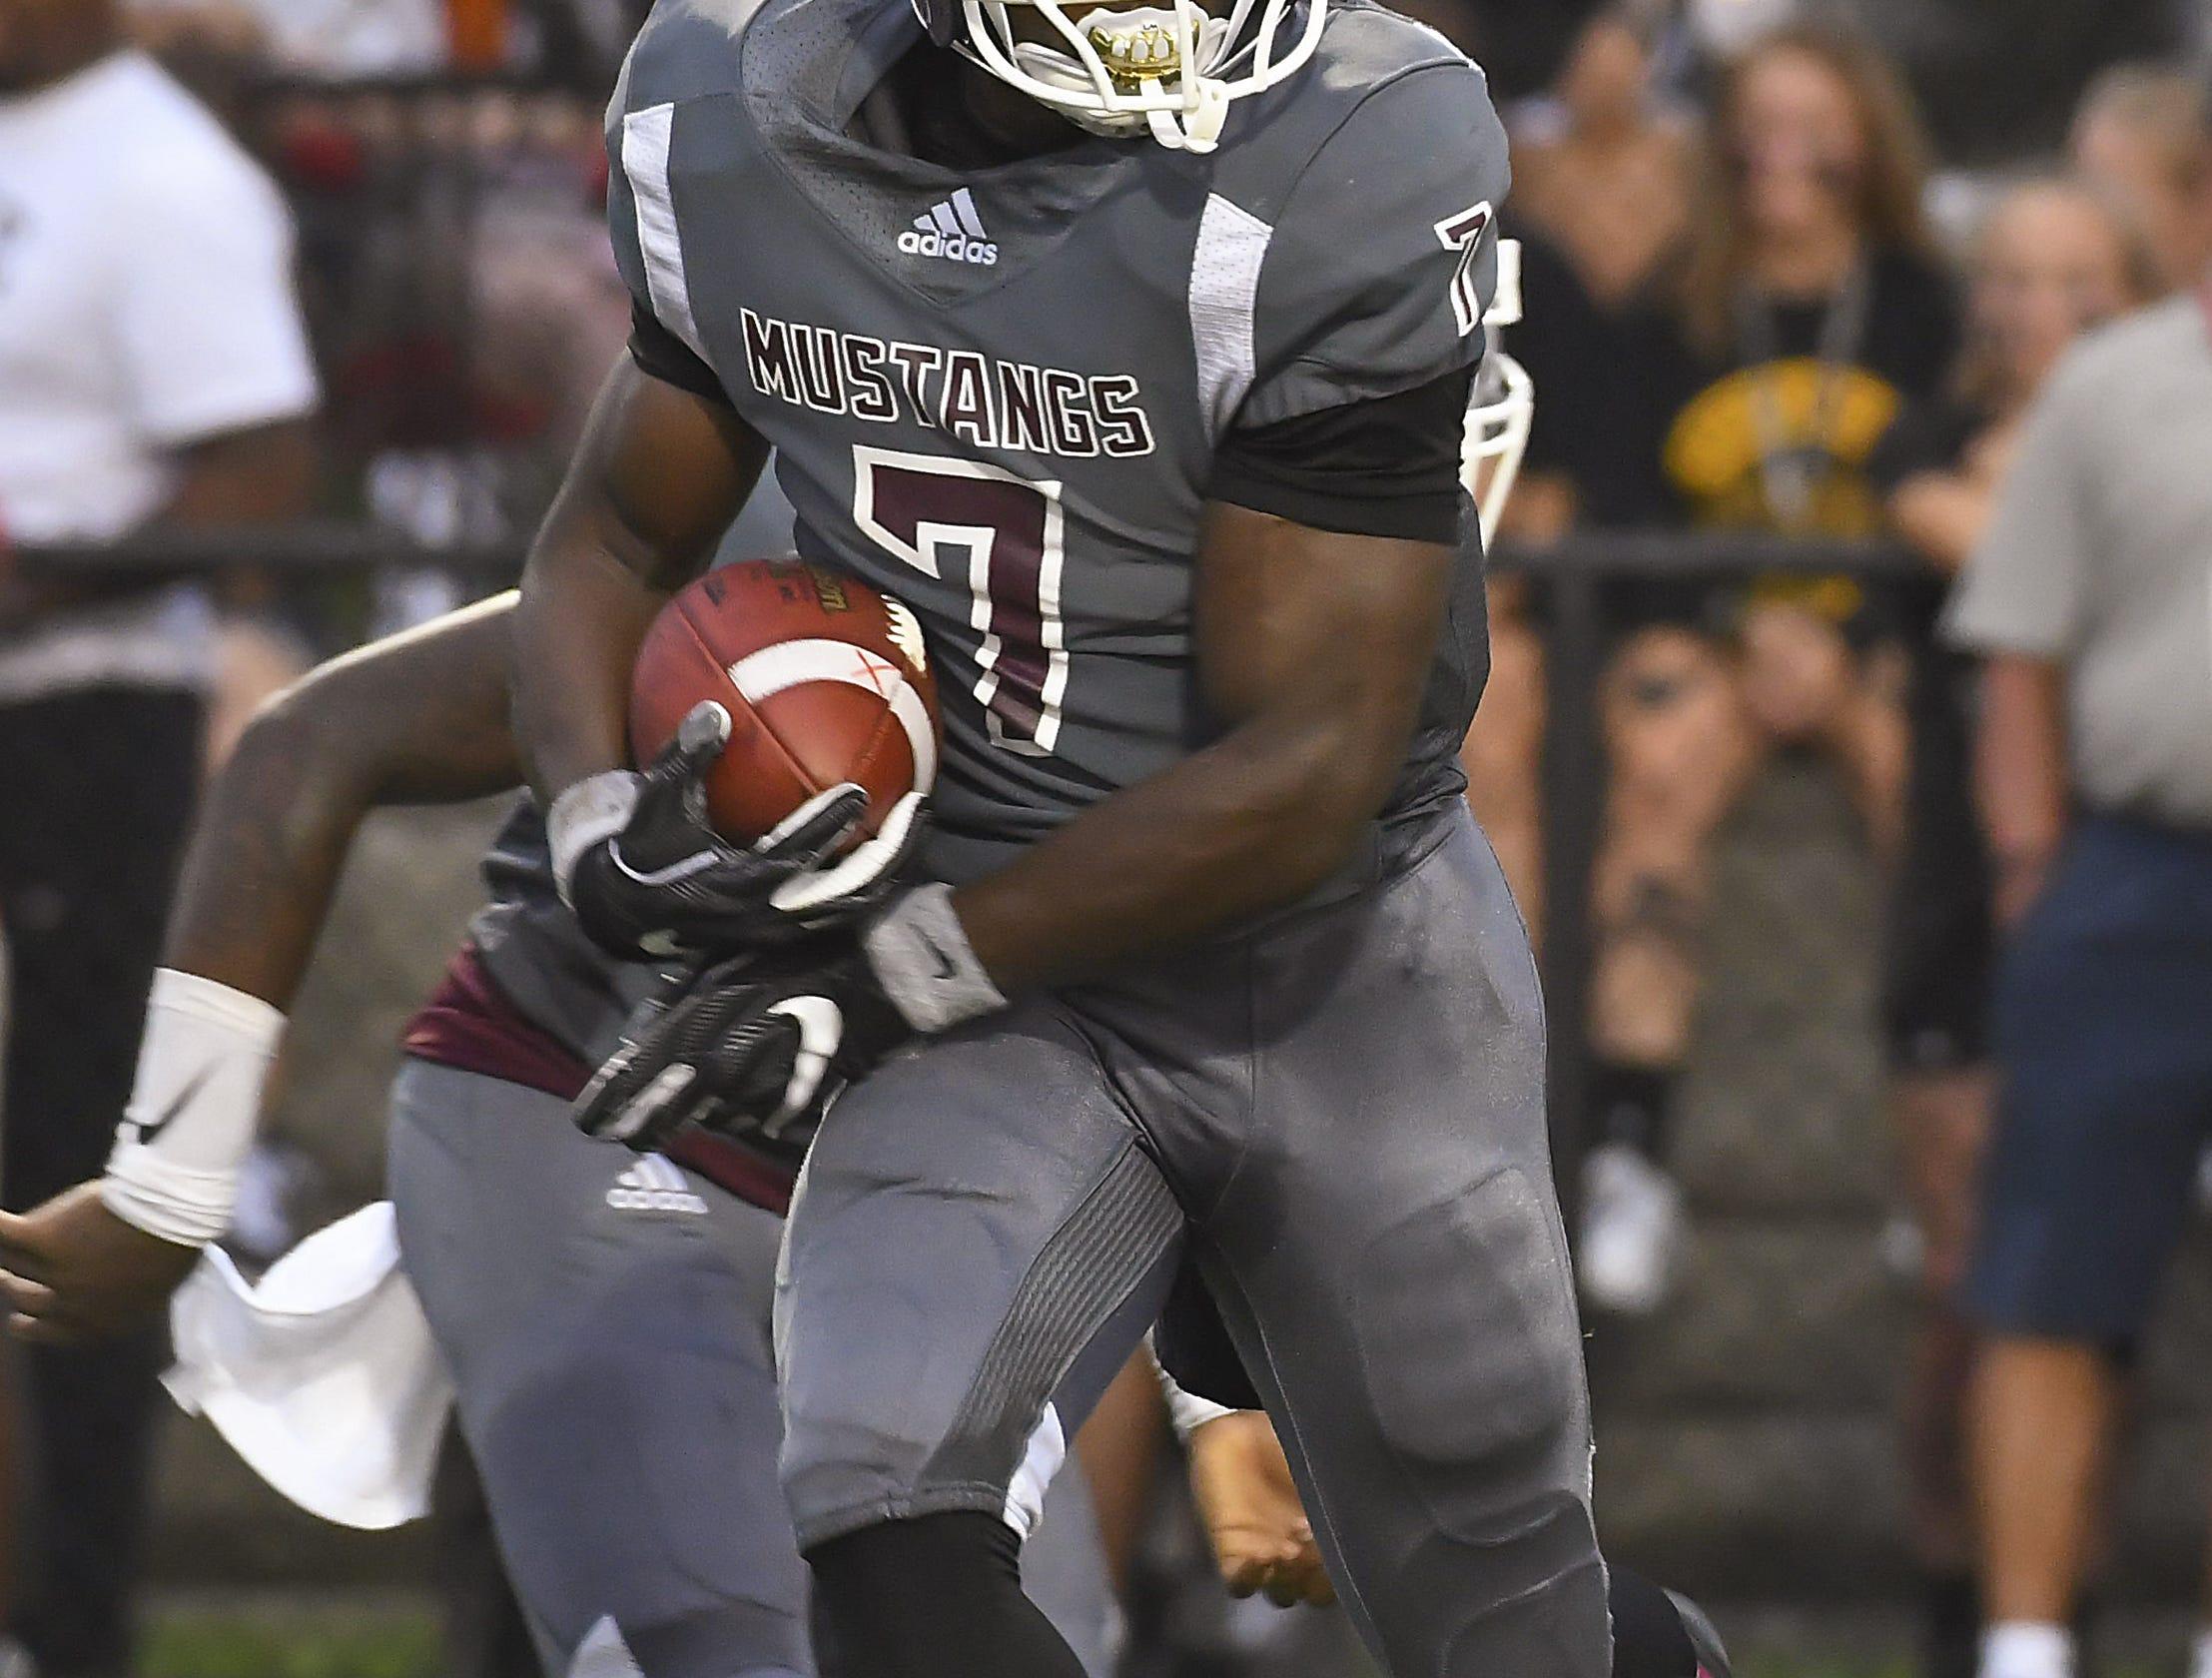 Mustangs running back Kayvon Britten runs the ball against  Roger Bacon, Western Hills High School, Aug. 31, 2018